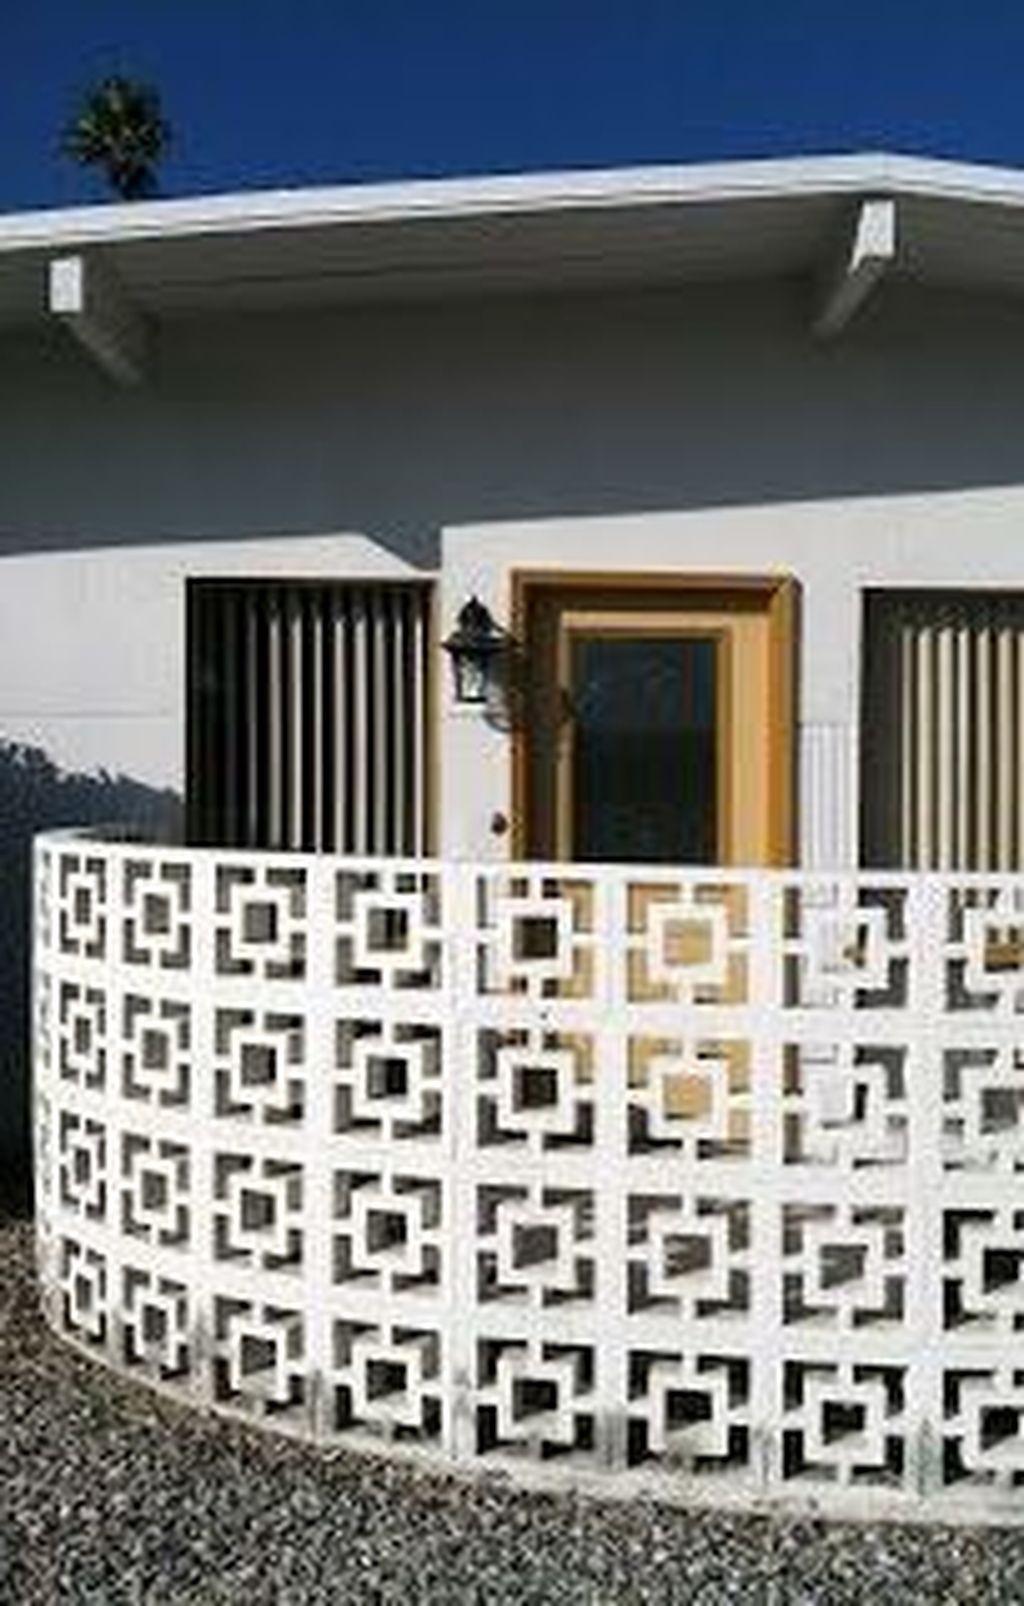 33 Fancy Breeze Block Wall Backyard Ideas For Your Inspiration In 2020 Breeze Block Wall Decorative Concrete Blocks Screen Block